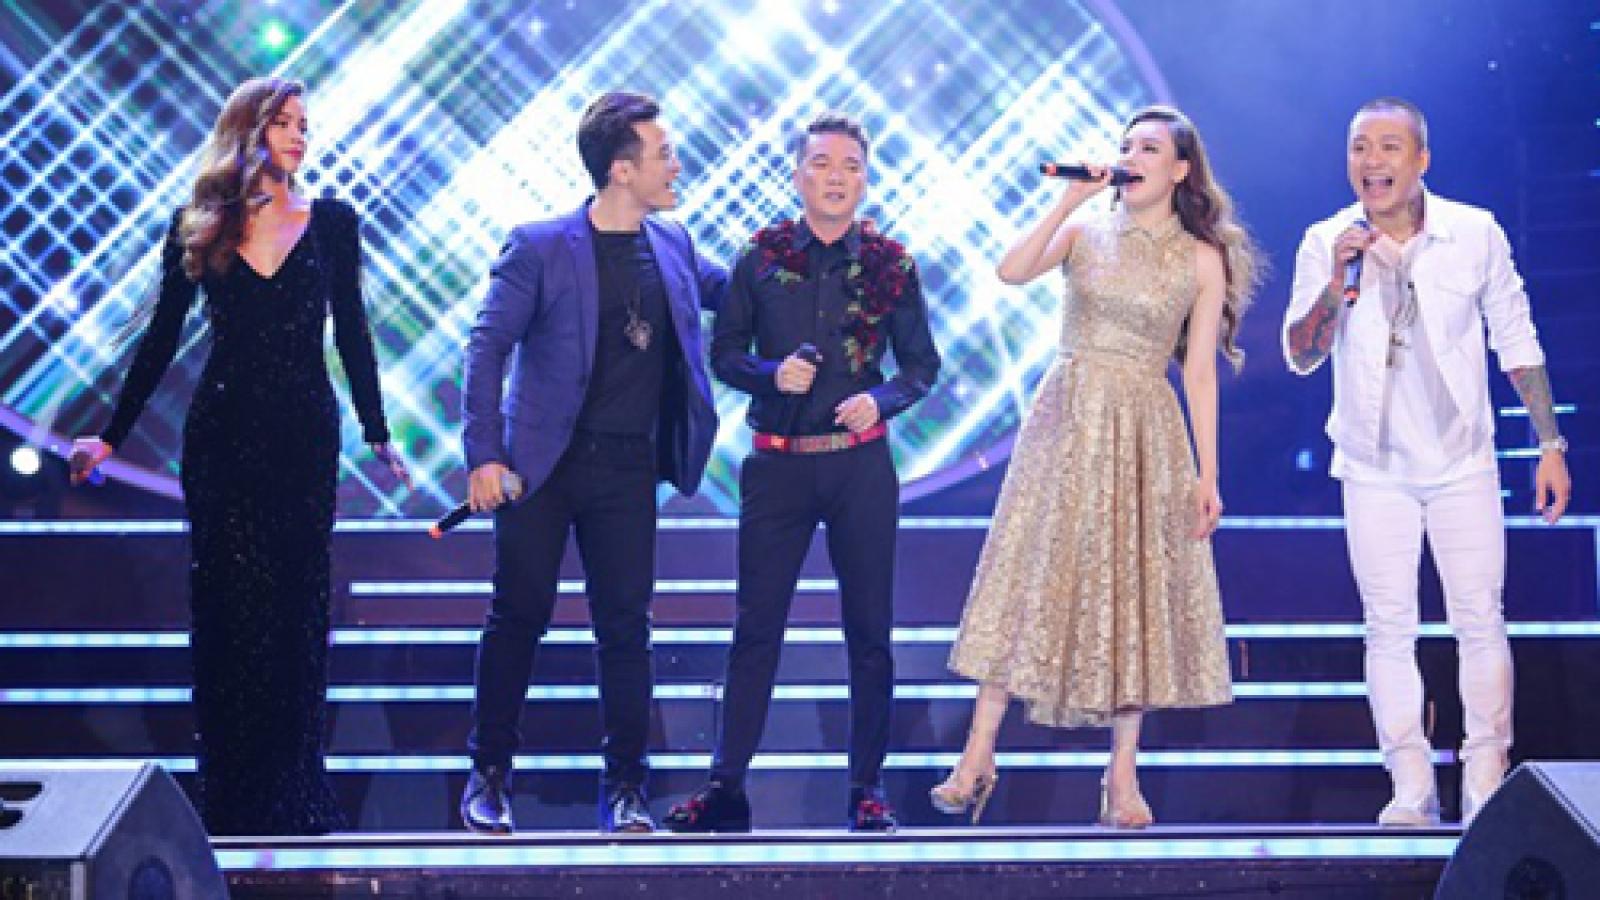 Celebs slay performances at V-Pop music awards